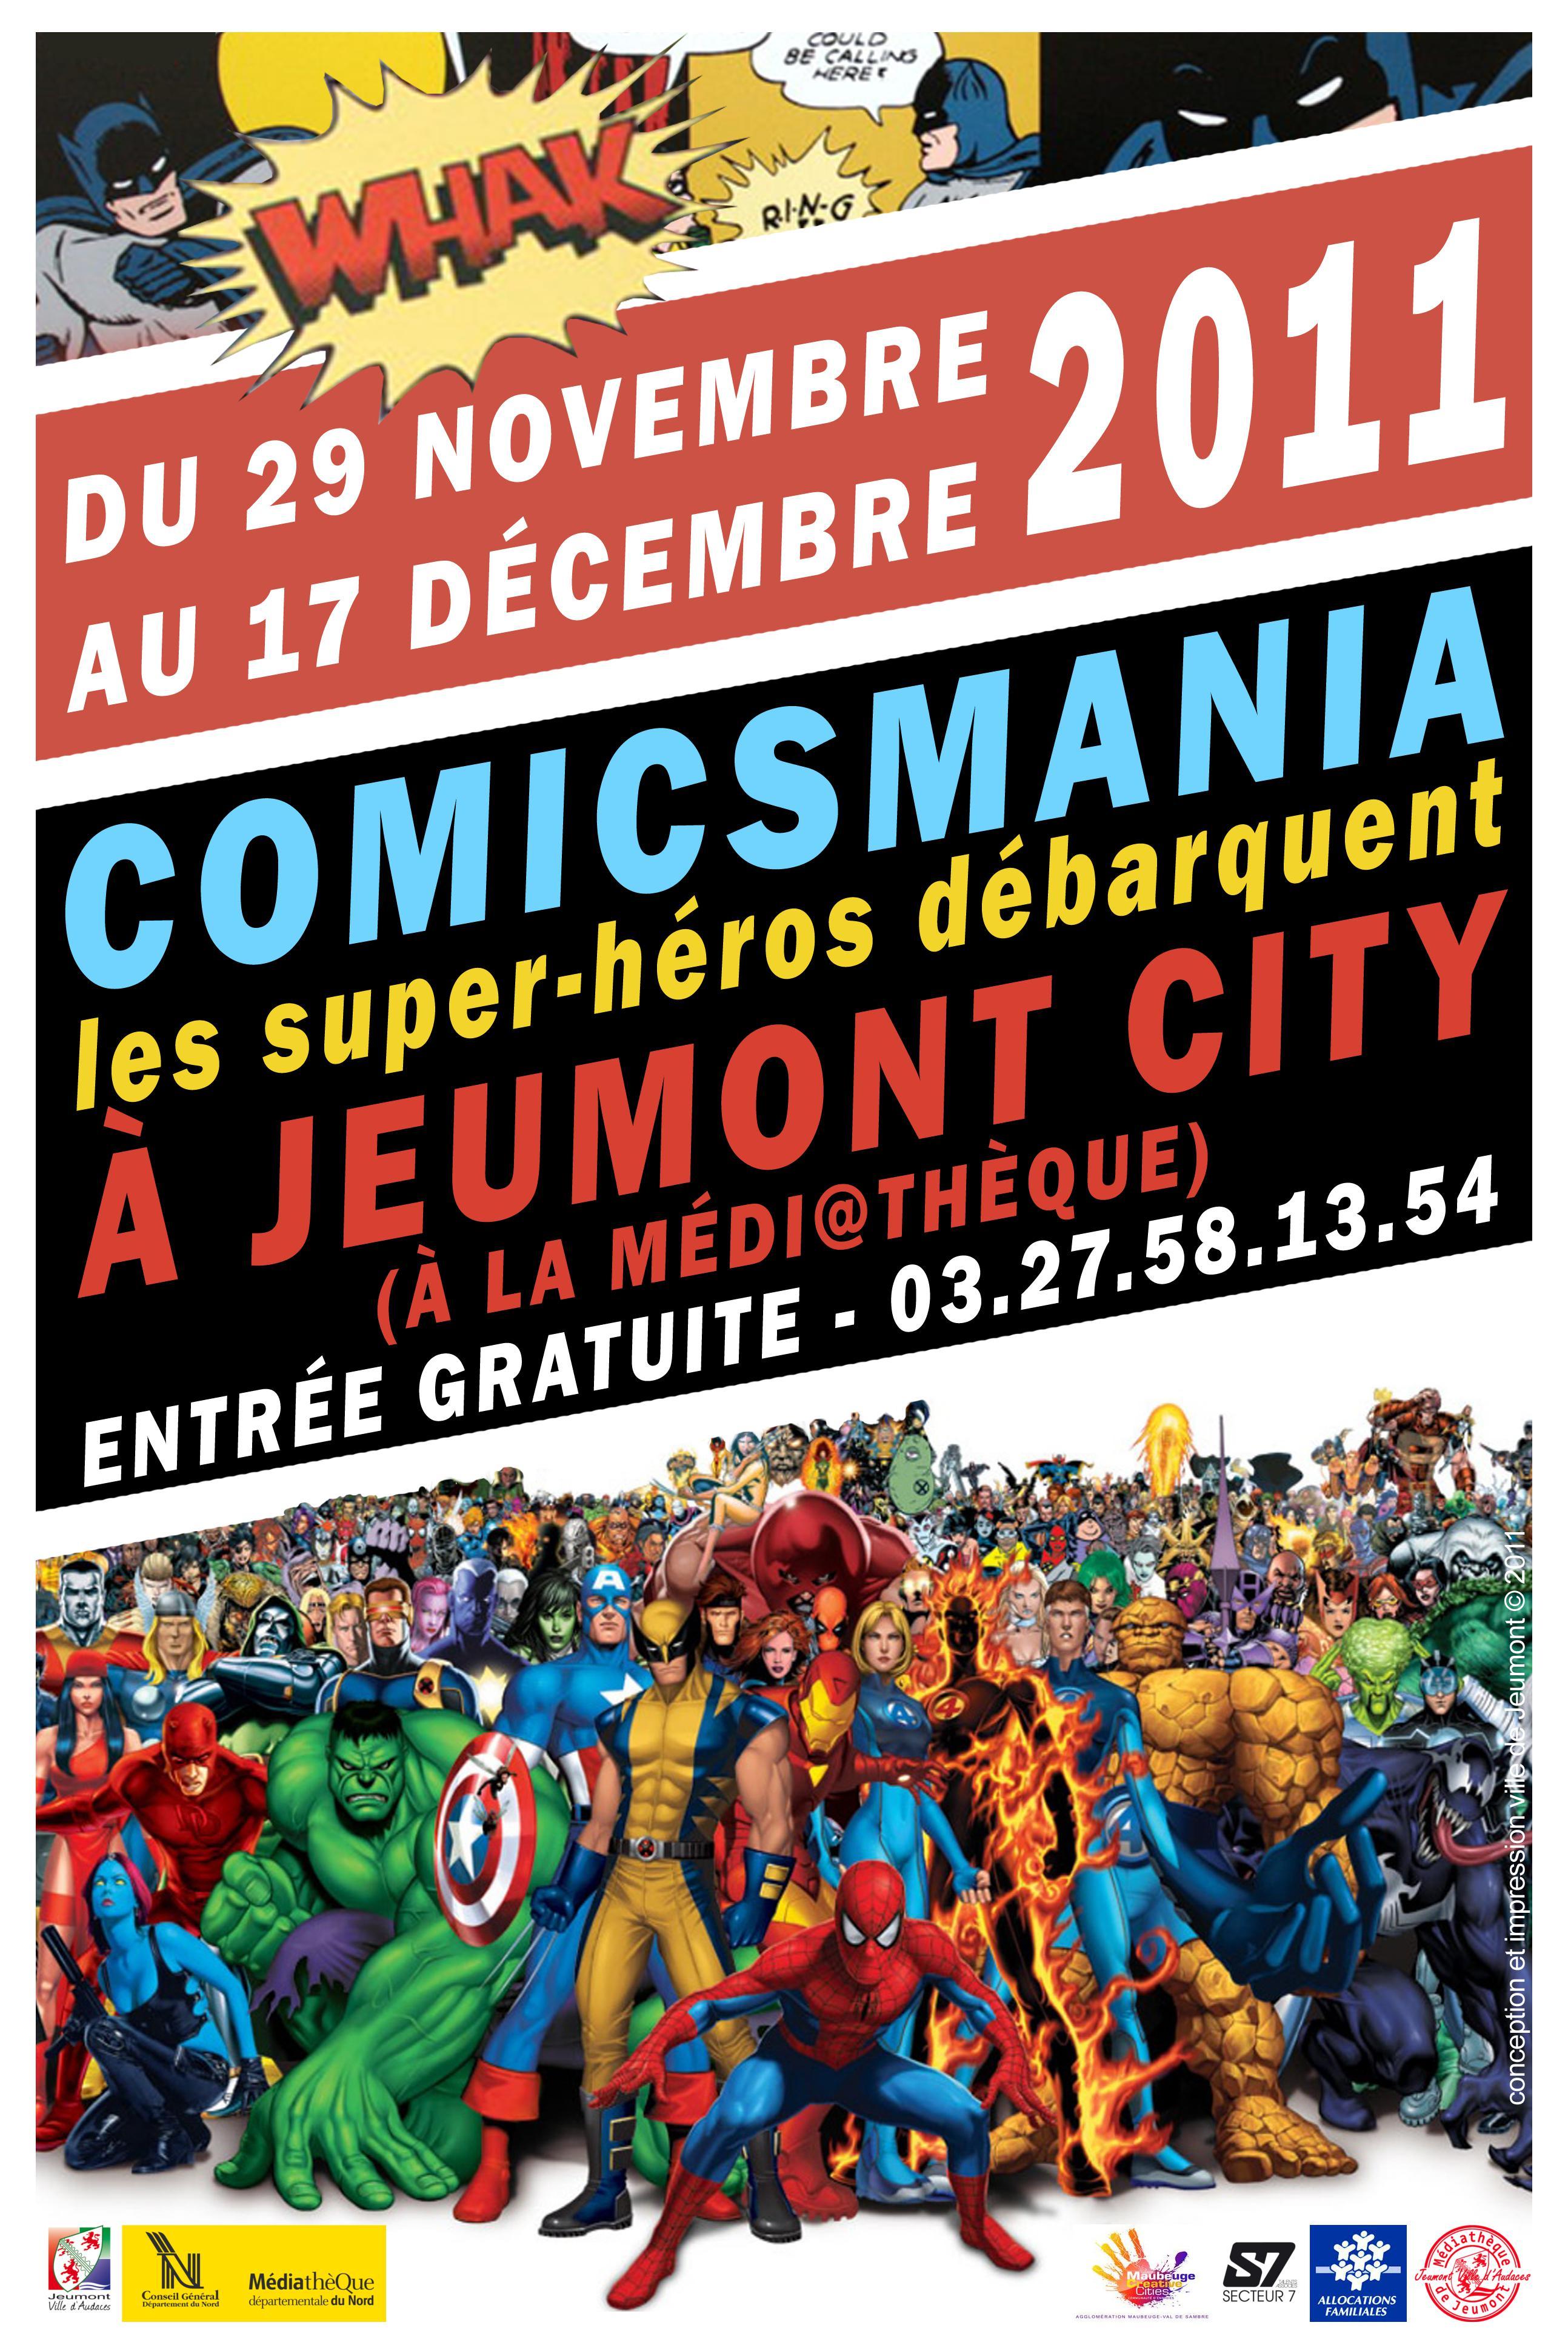 http://www.lamediatheque-jeumont.fr/wp-content/uploads/2011/11/affiche_comics1.jpg